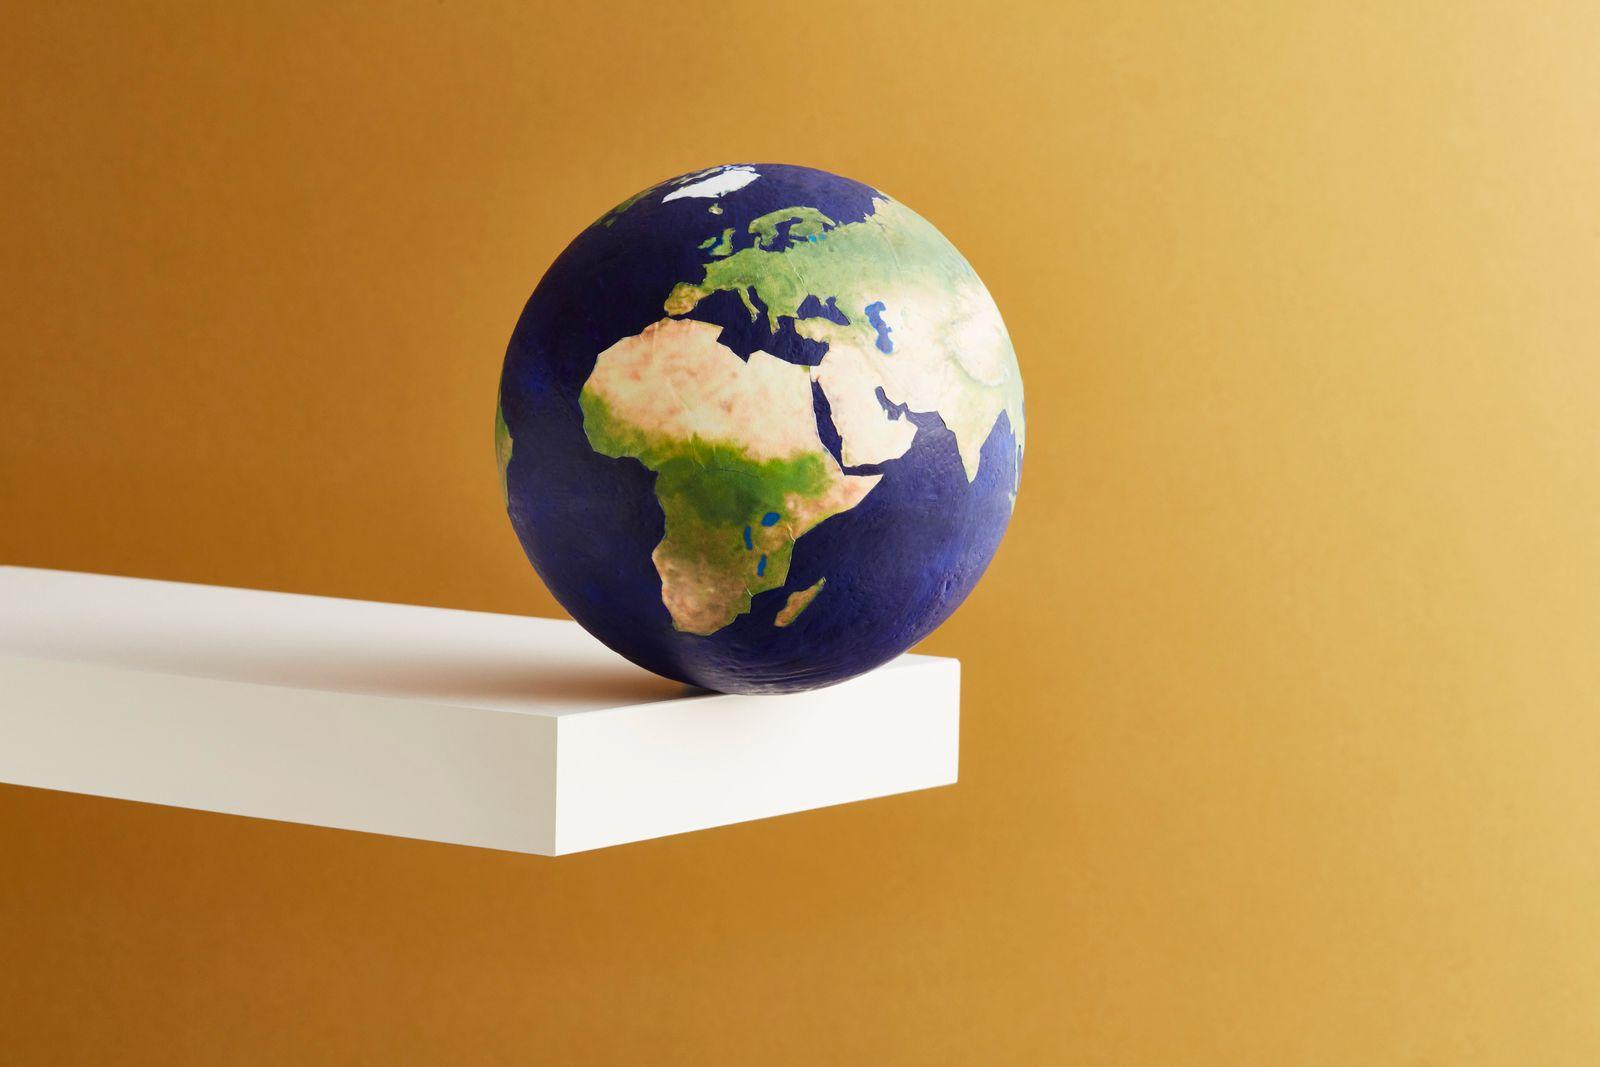 A world globe balanced on the edge of a shelf